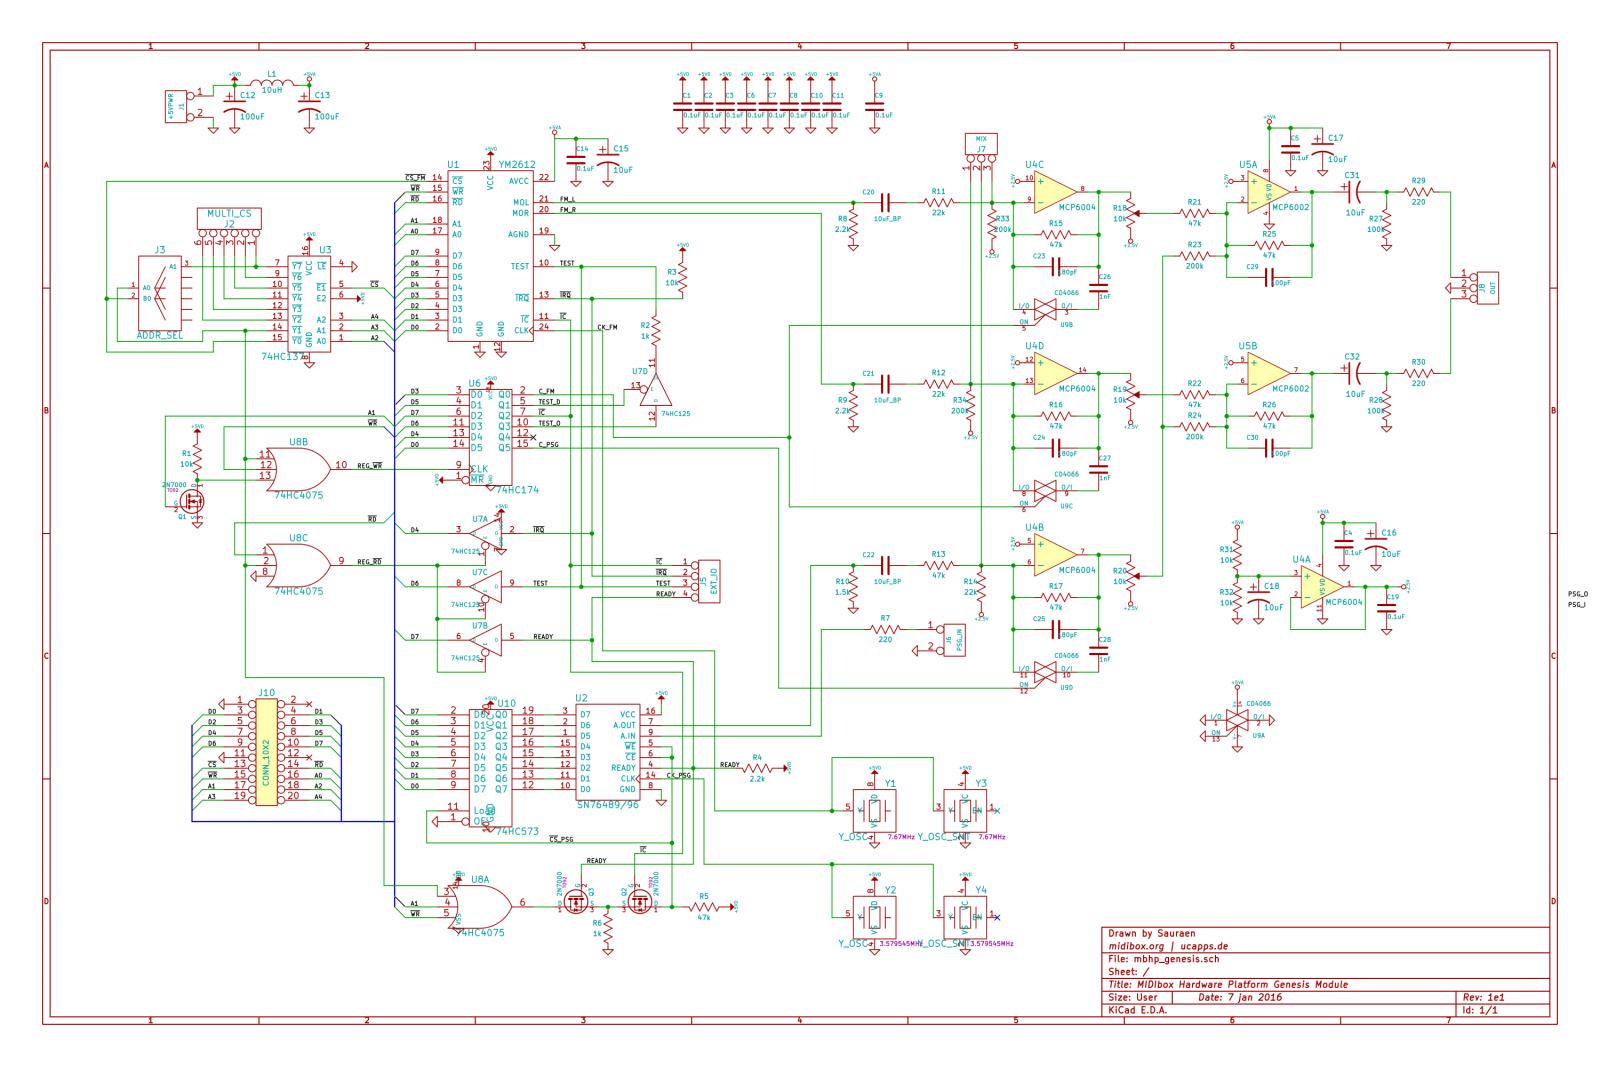 OLD VERSION MBHP_Genesis module schematic (rev. 1e1, for use with boards rev. 1e)